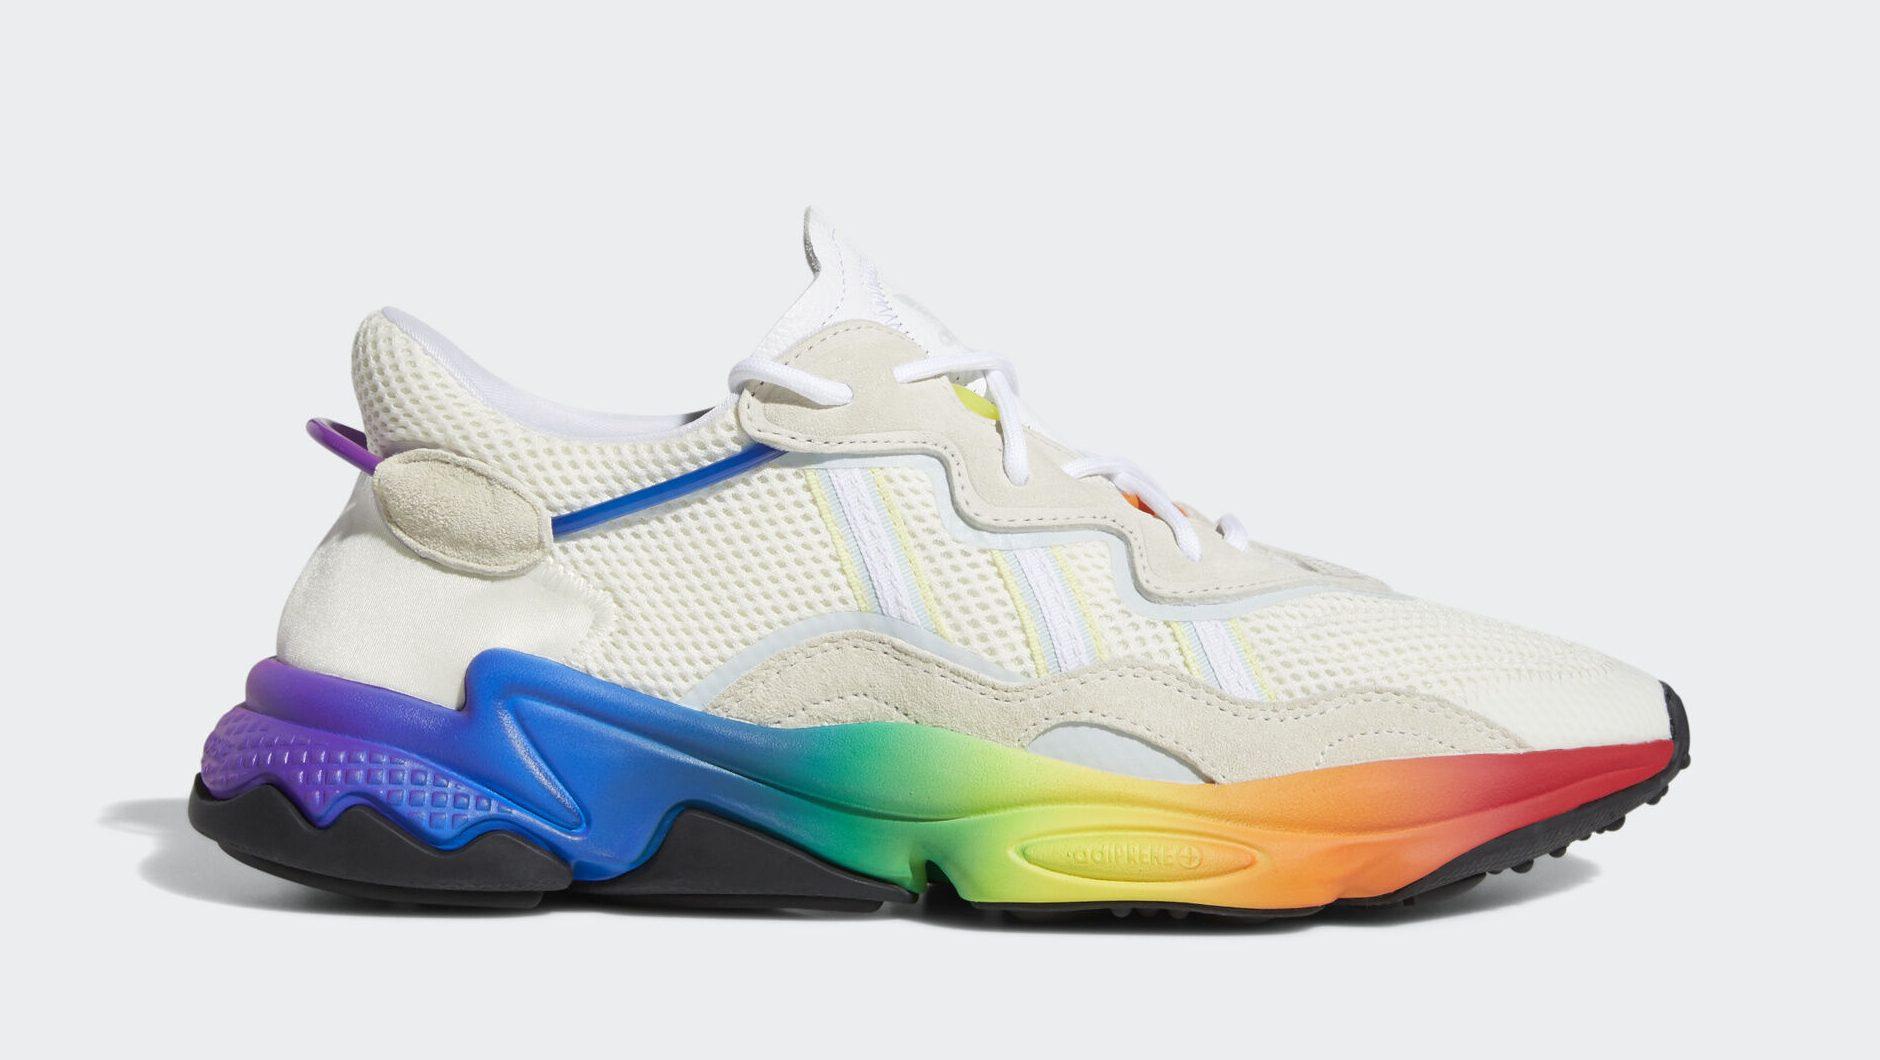 Adidas Ozweego 2019 'Pride' Shoes